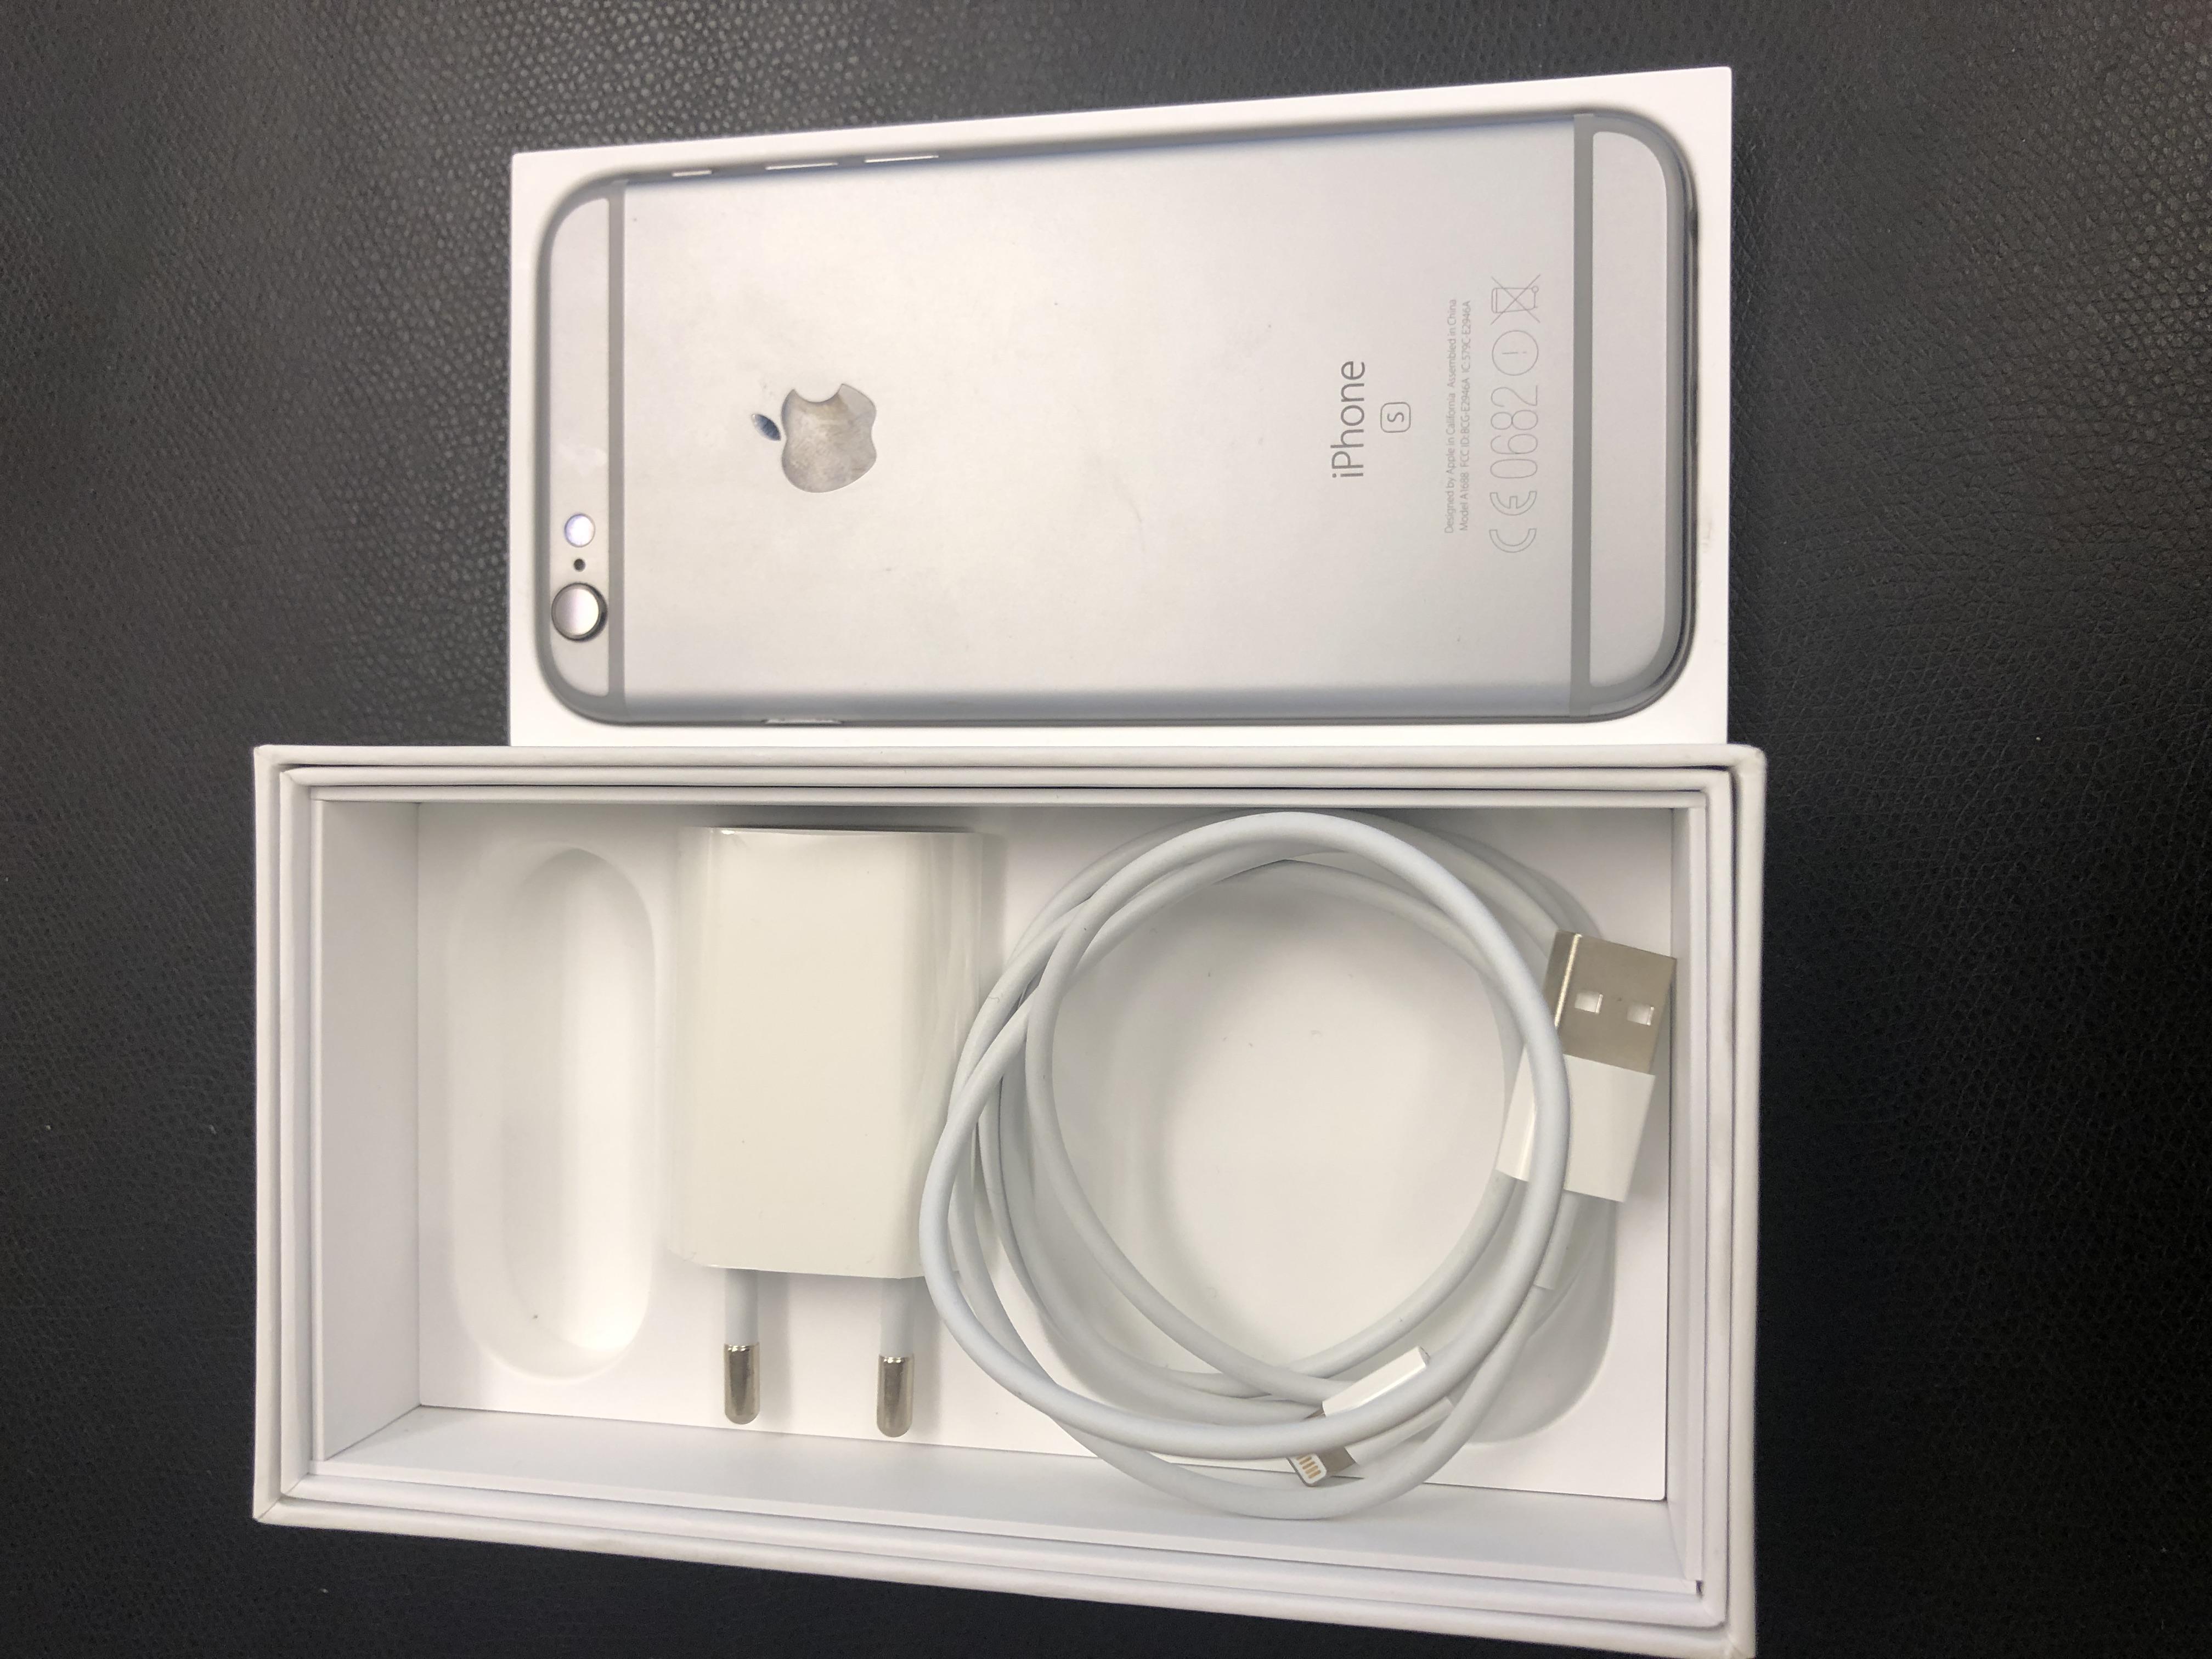 iPhone 6S 16GB, 32GB, Gray, bild 1